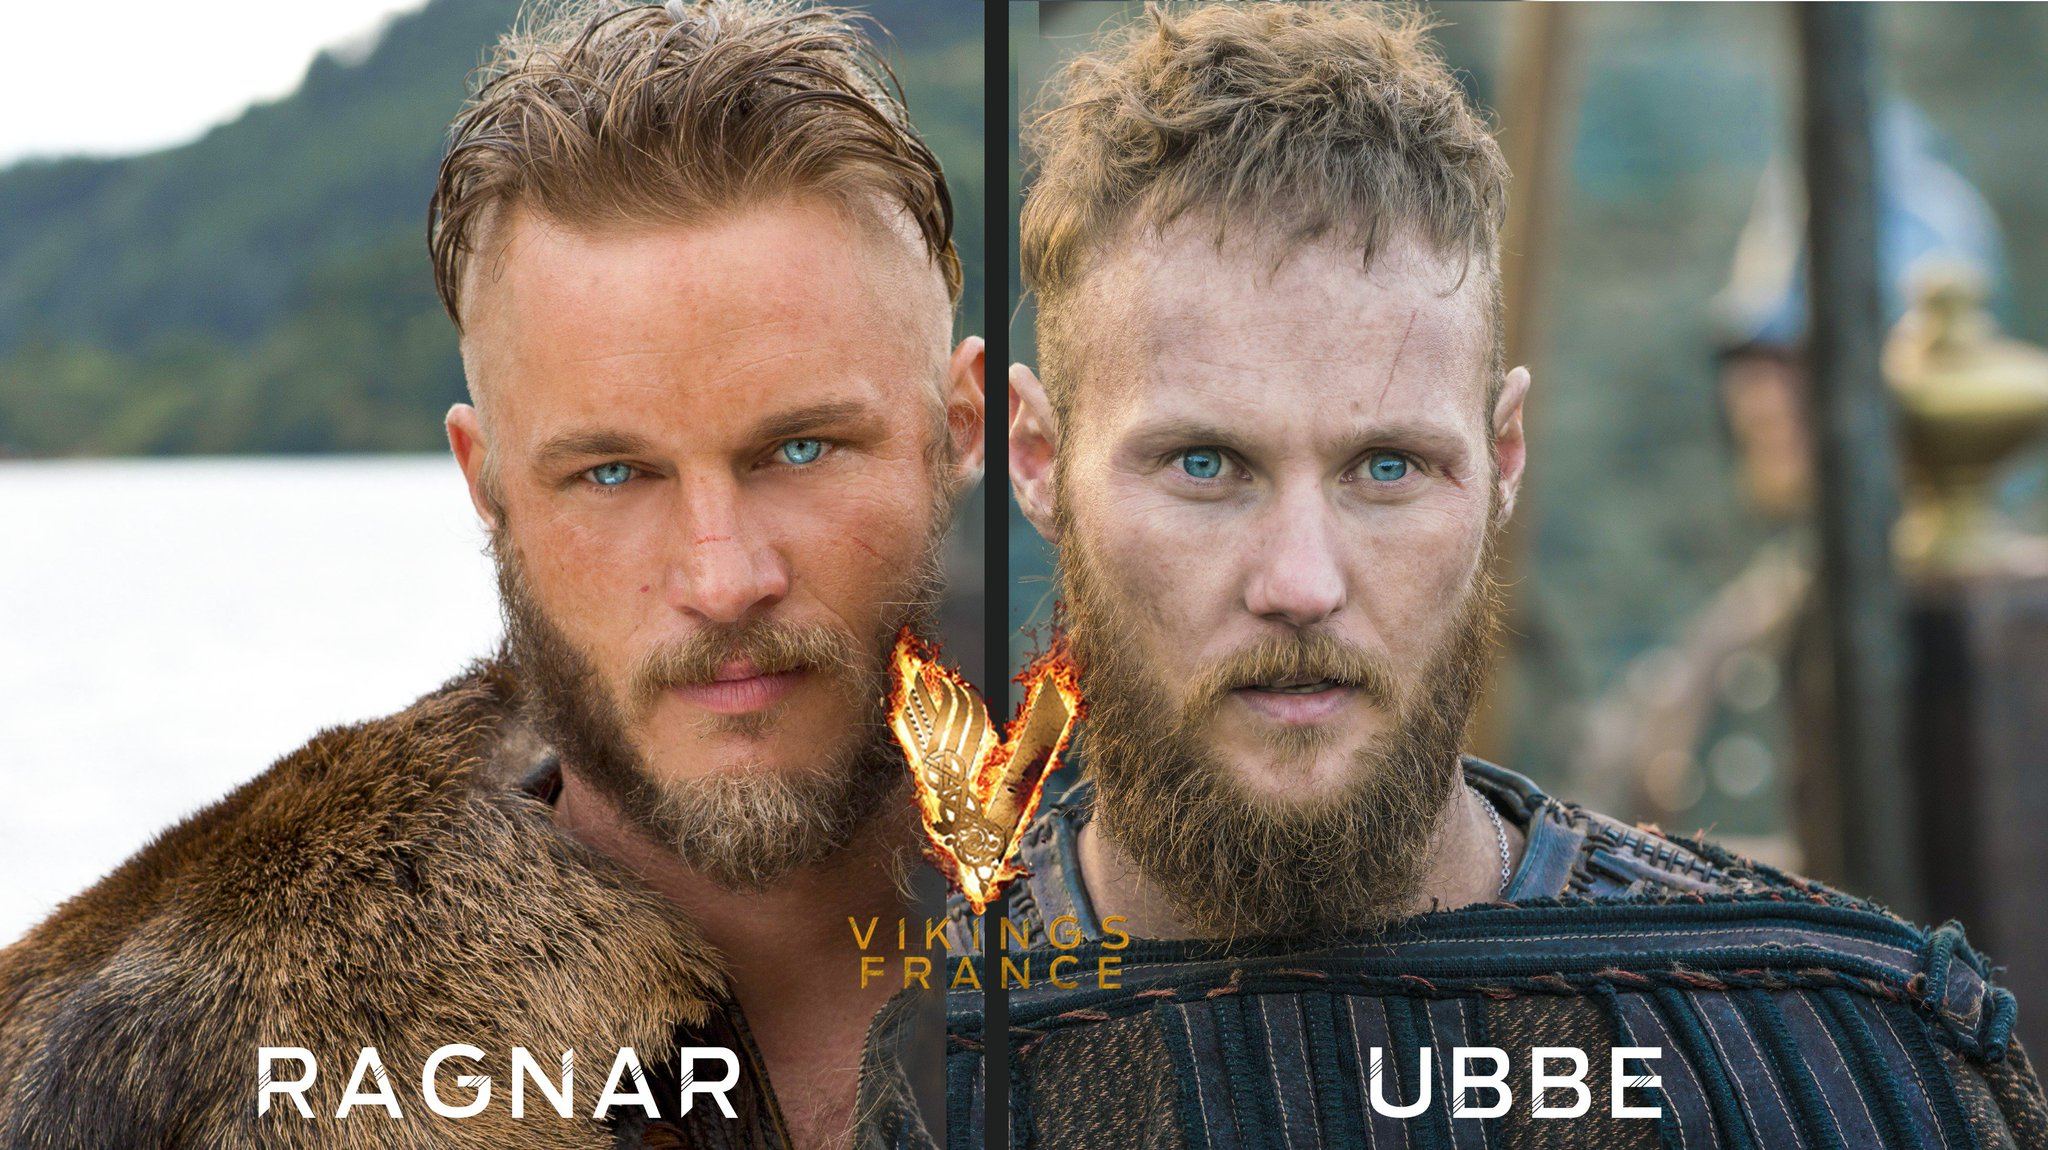 Vikings France On Twitter Tels Pères Tels Fils Vikings Ubbe Ragnar